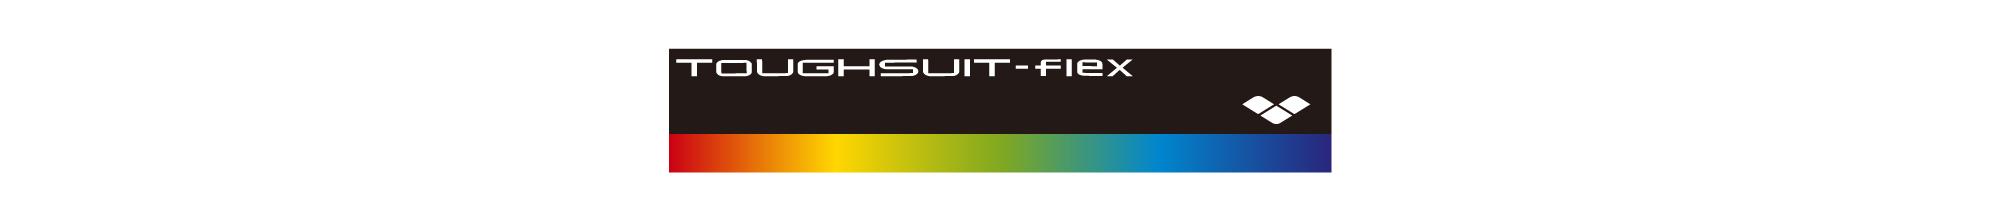 TOUGHSUIT-FLEX-swimwear